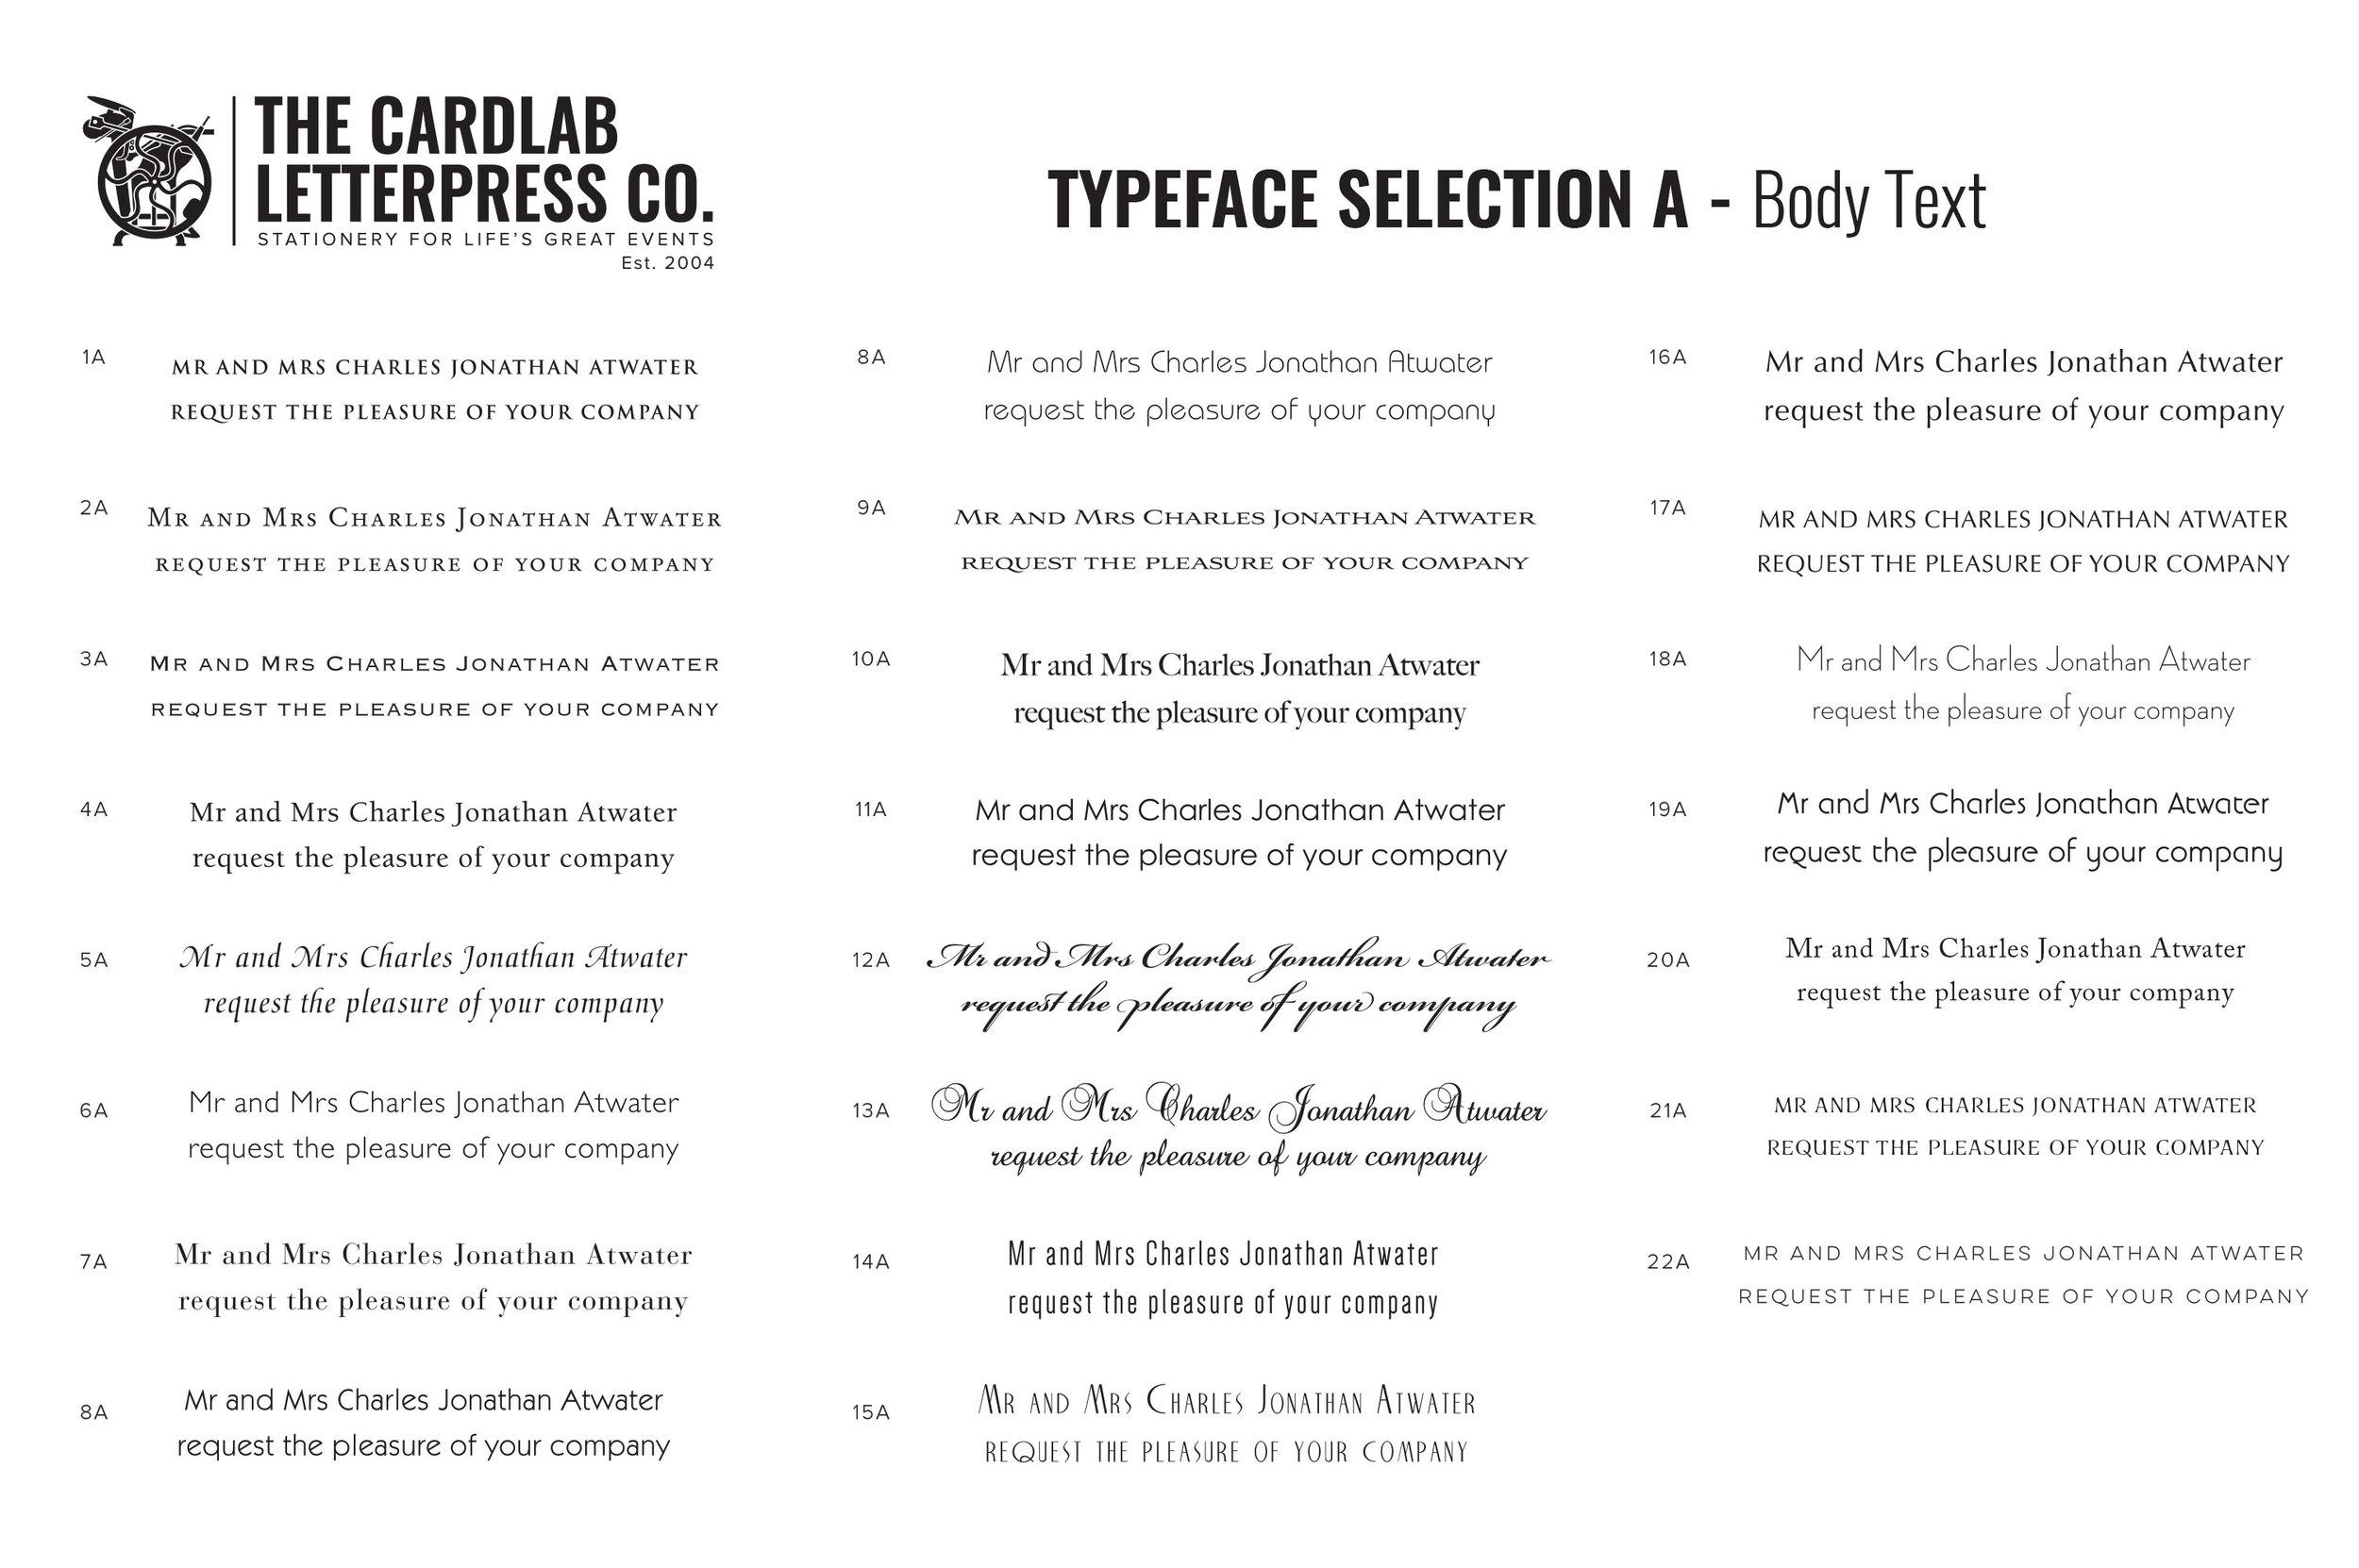 Cardlab-TypefacesA.jpg